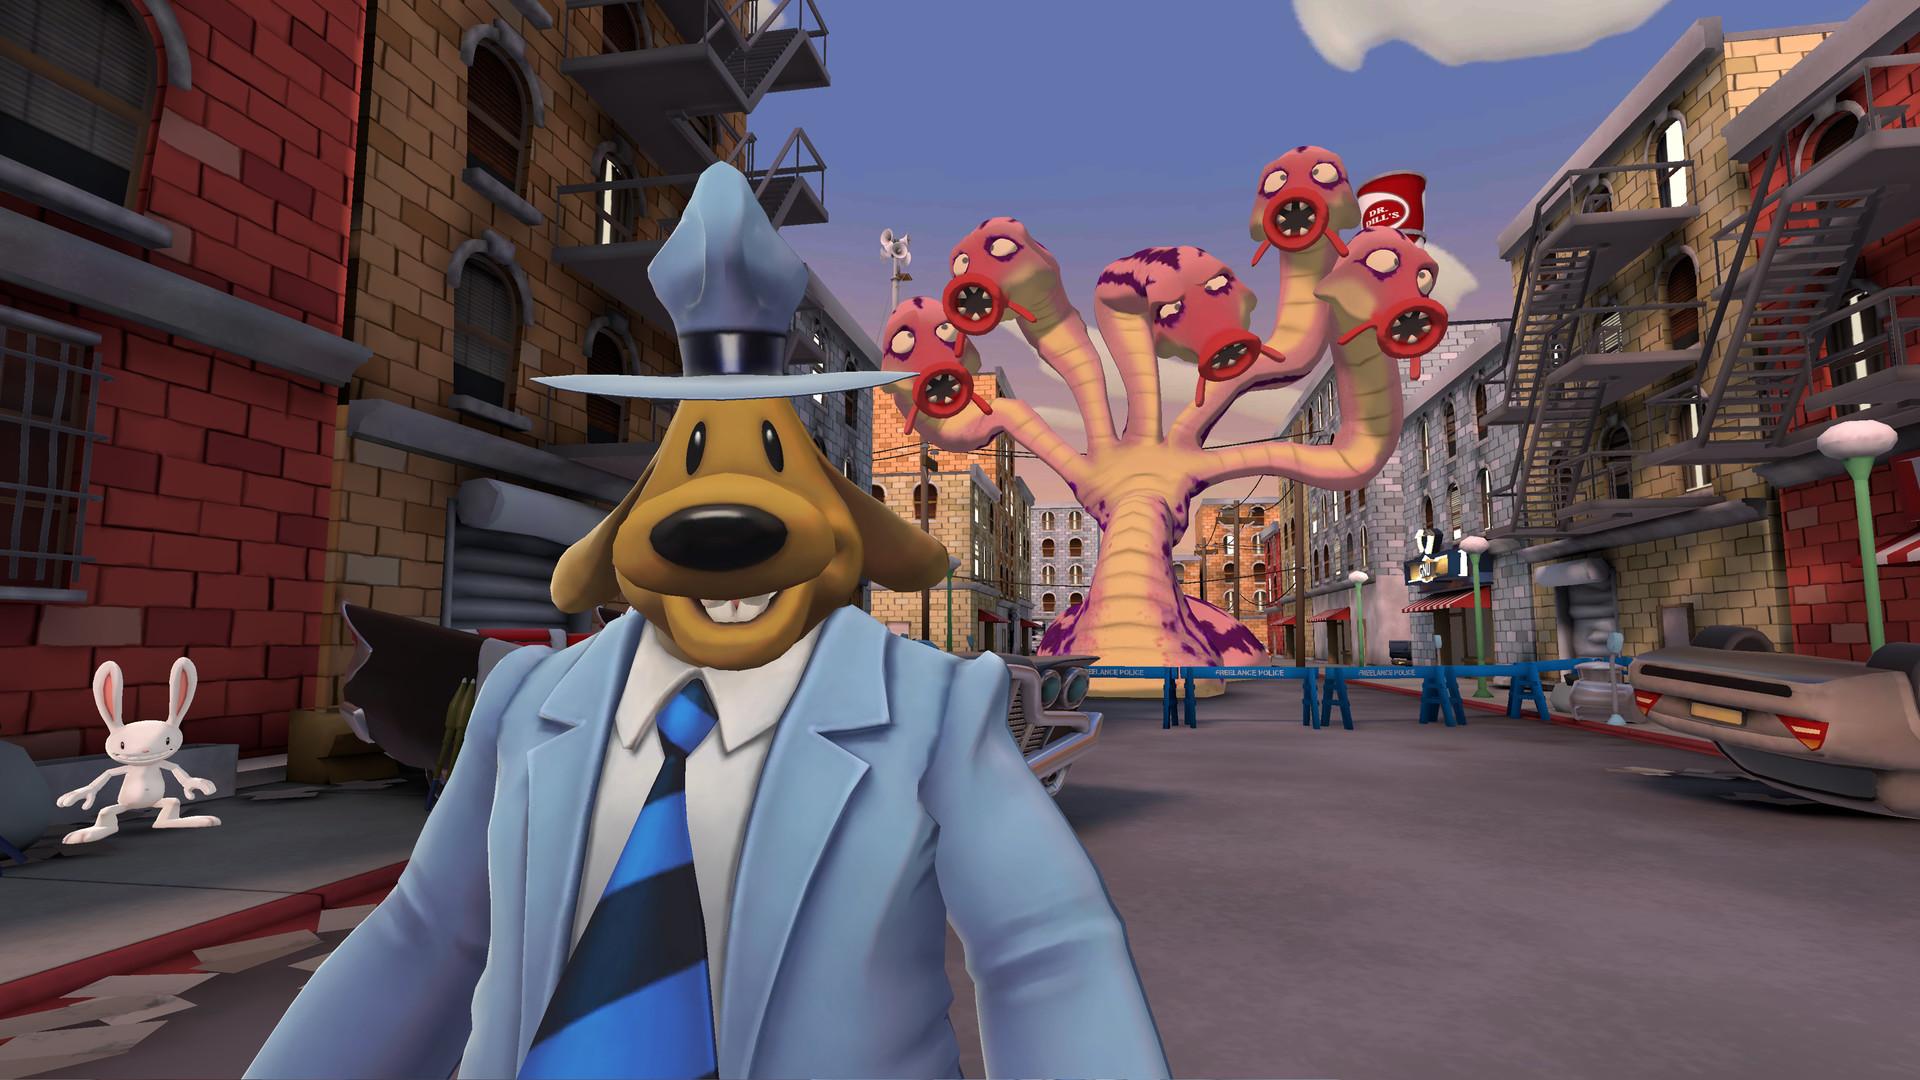 Oculus Quest 游戏《Sam & Max: This Time It's Virtual!》山姆和麦克斯:虚拟警探插图(4)